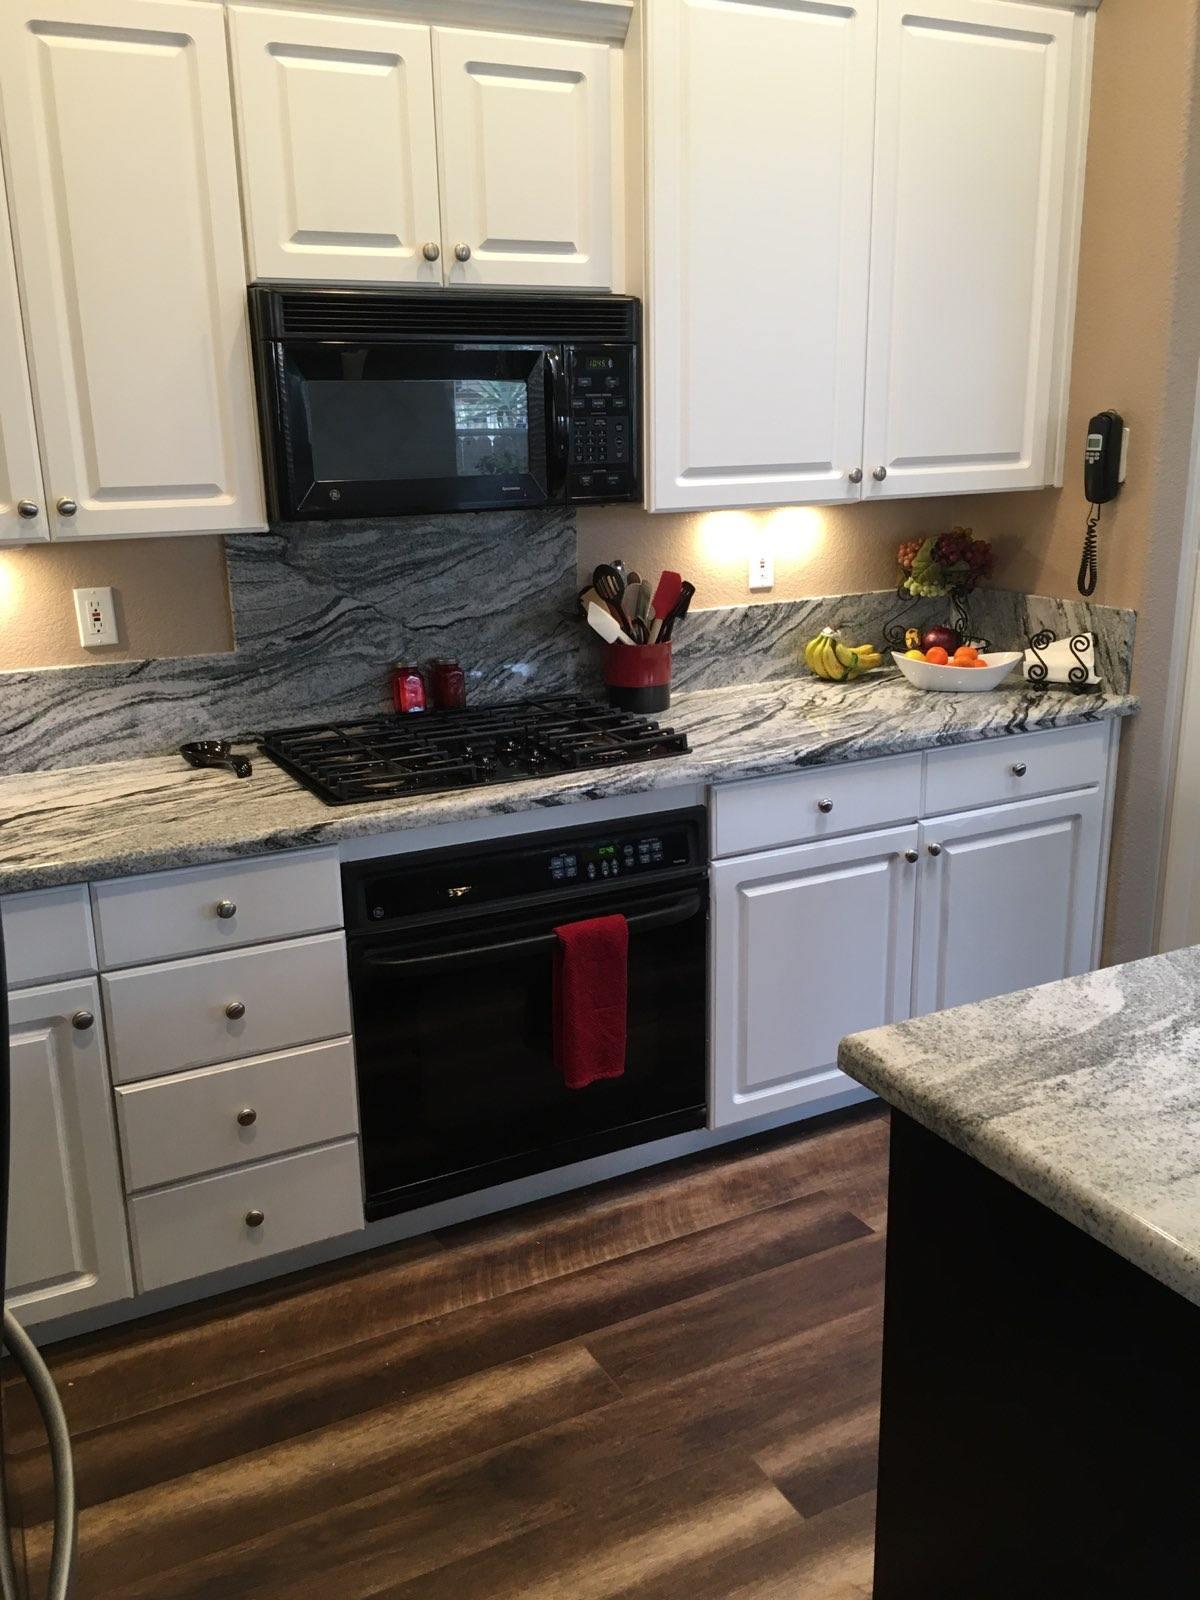 Viscount White Granite Kitchen Countertops with a Demi Bullnsoe